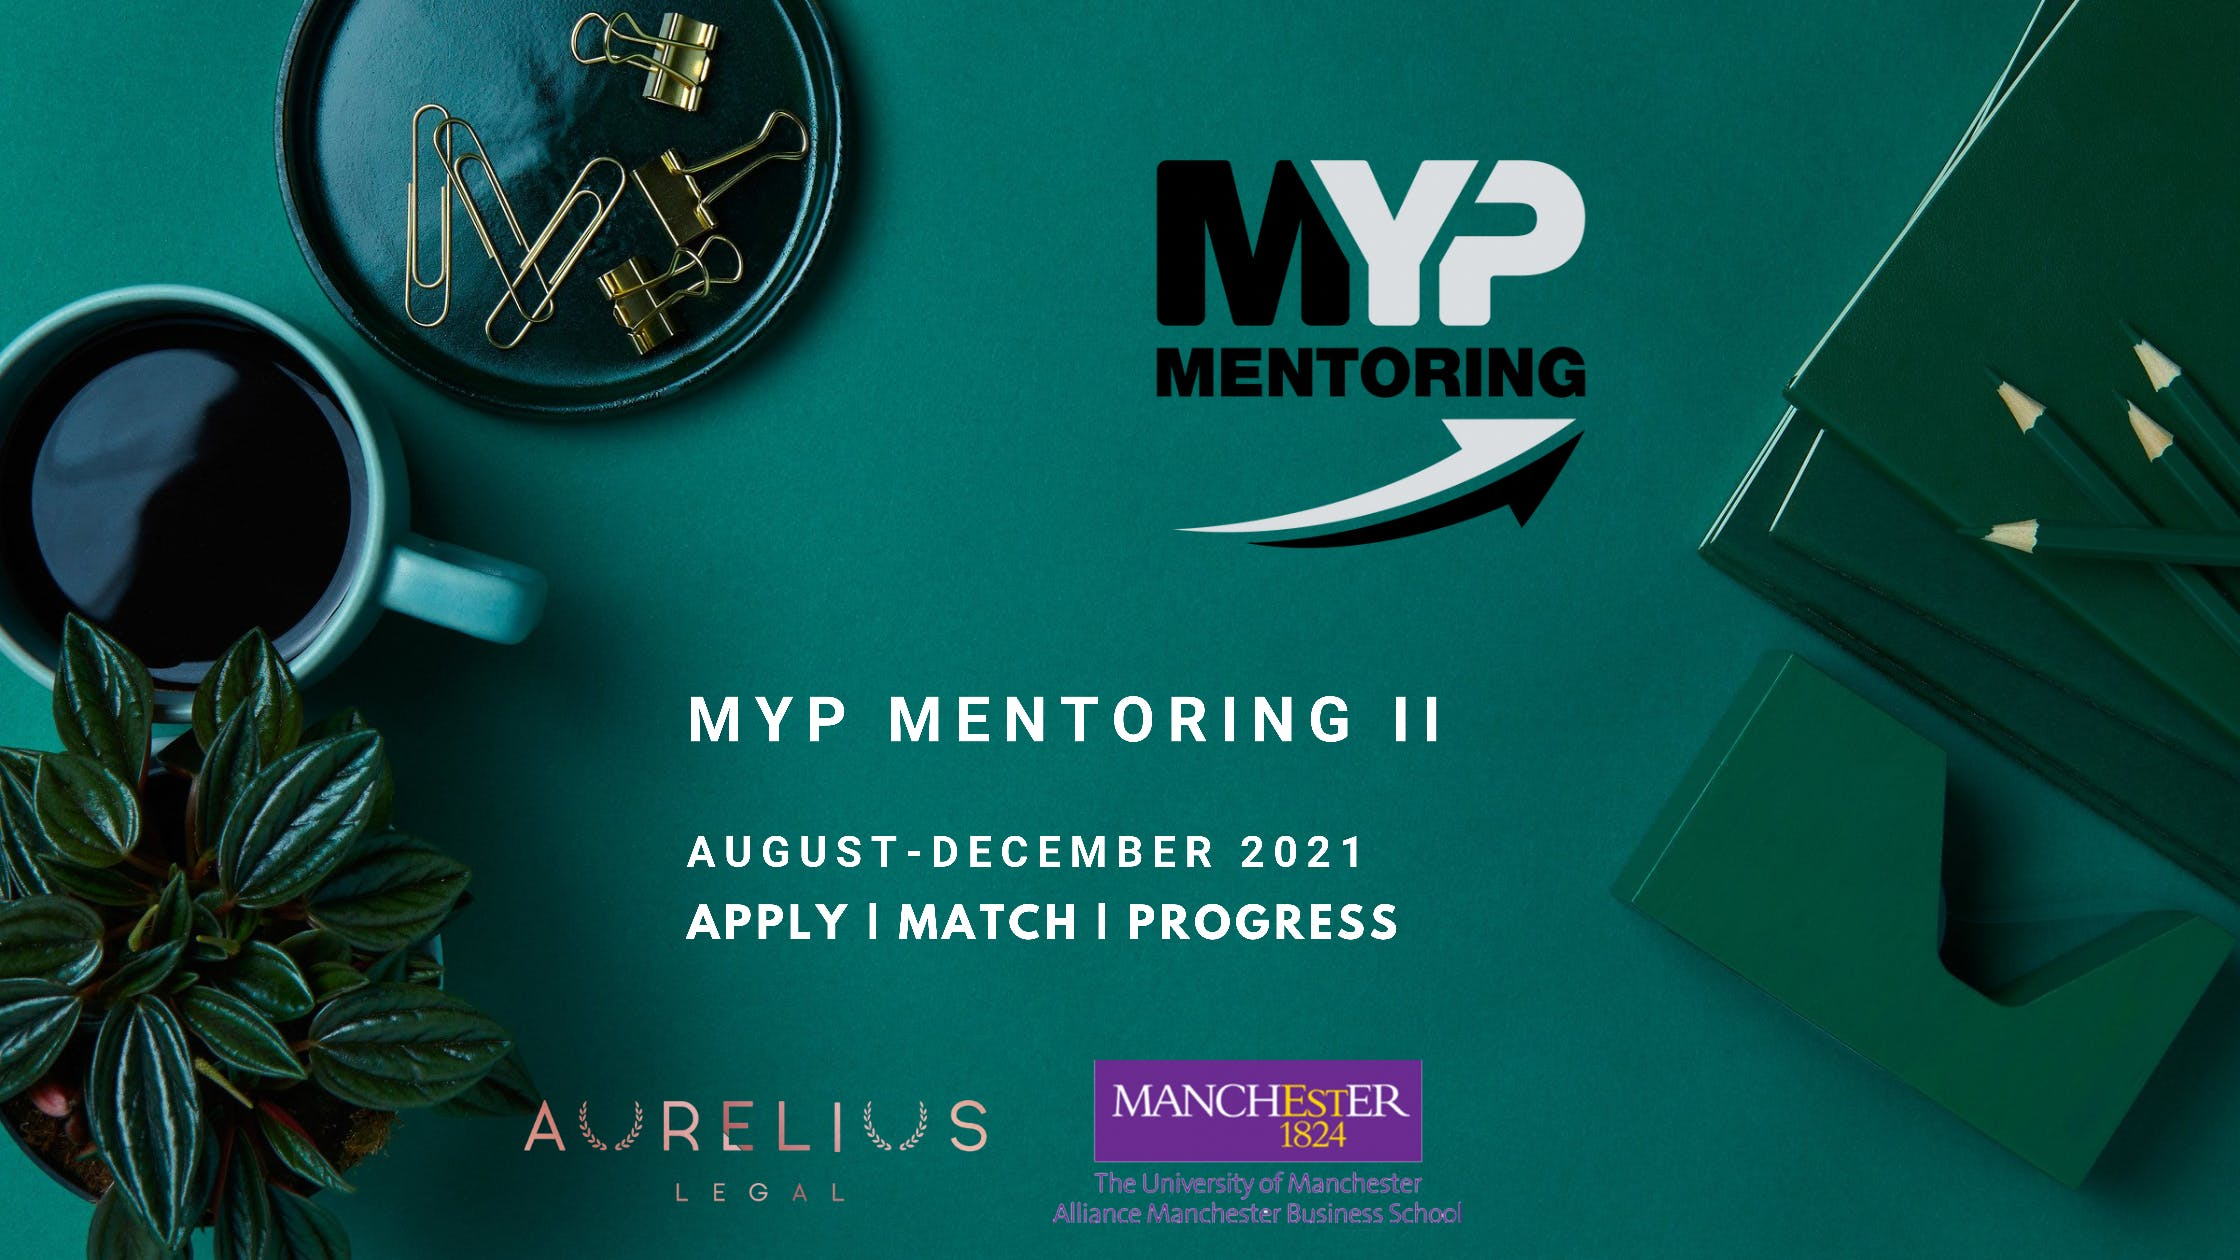 MYP Mentoring II: The Comeback